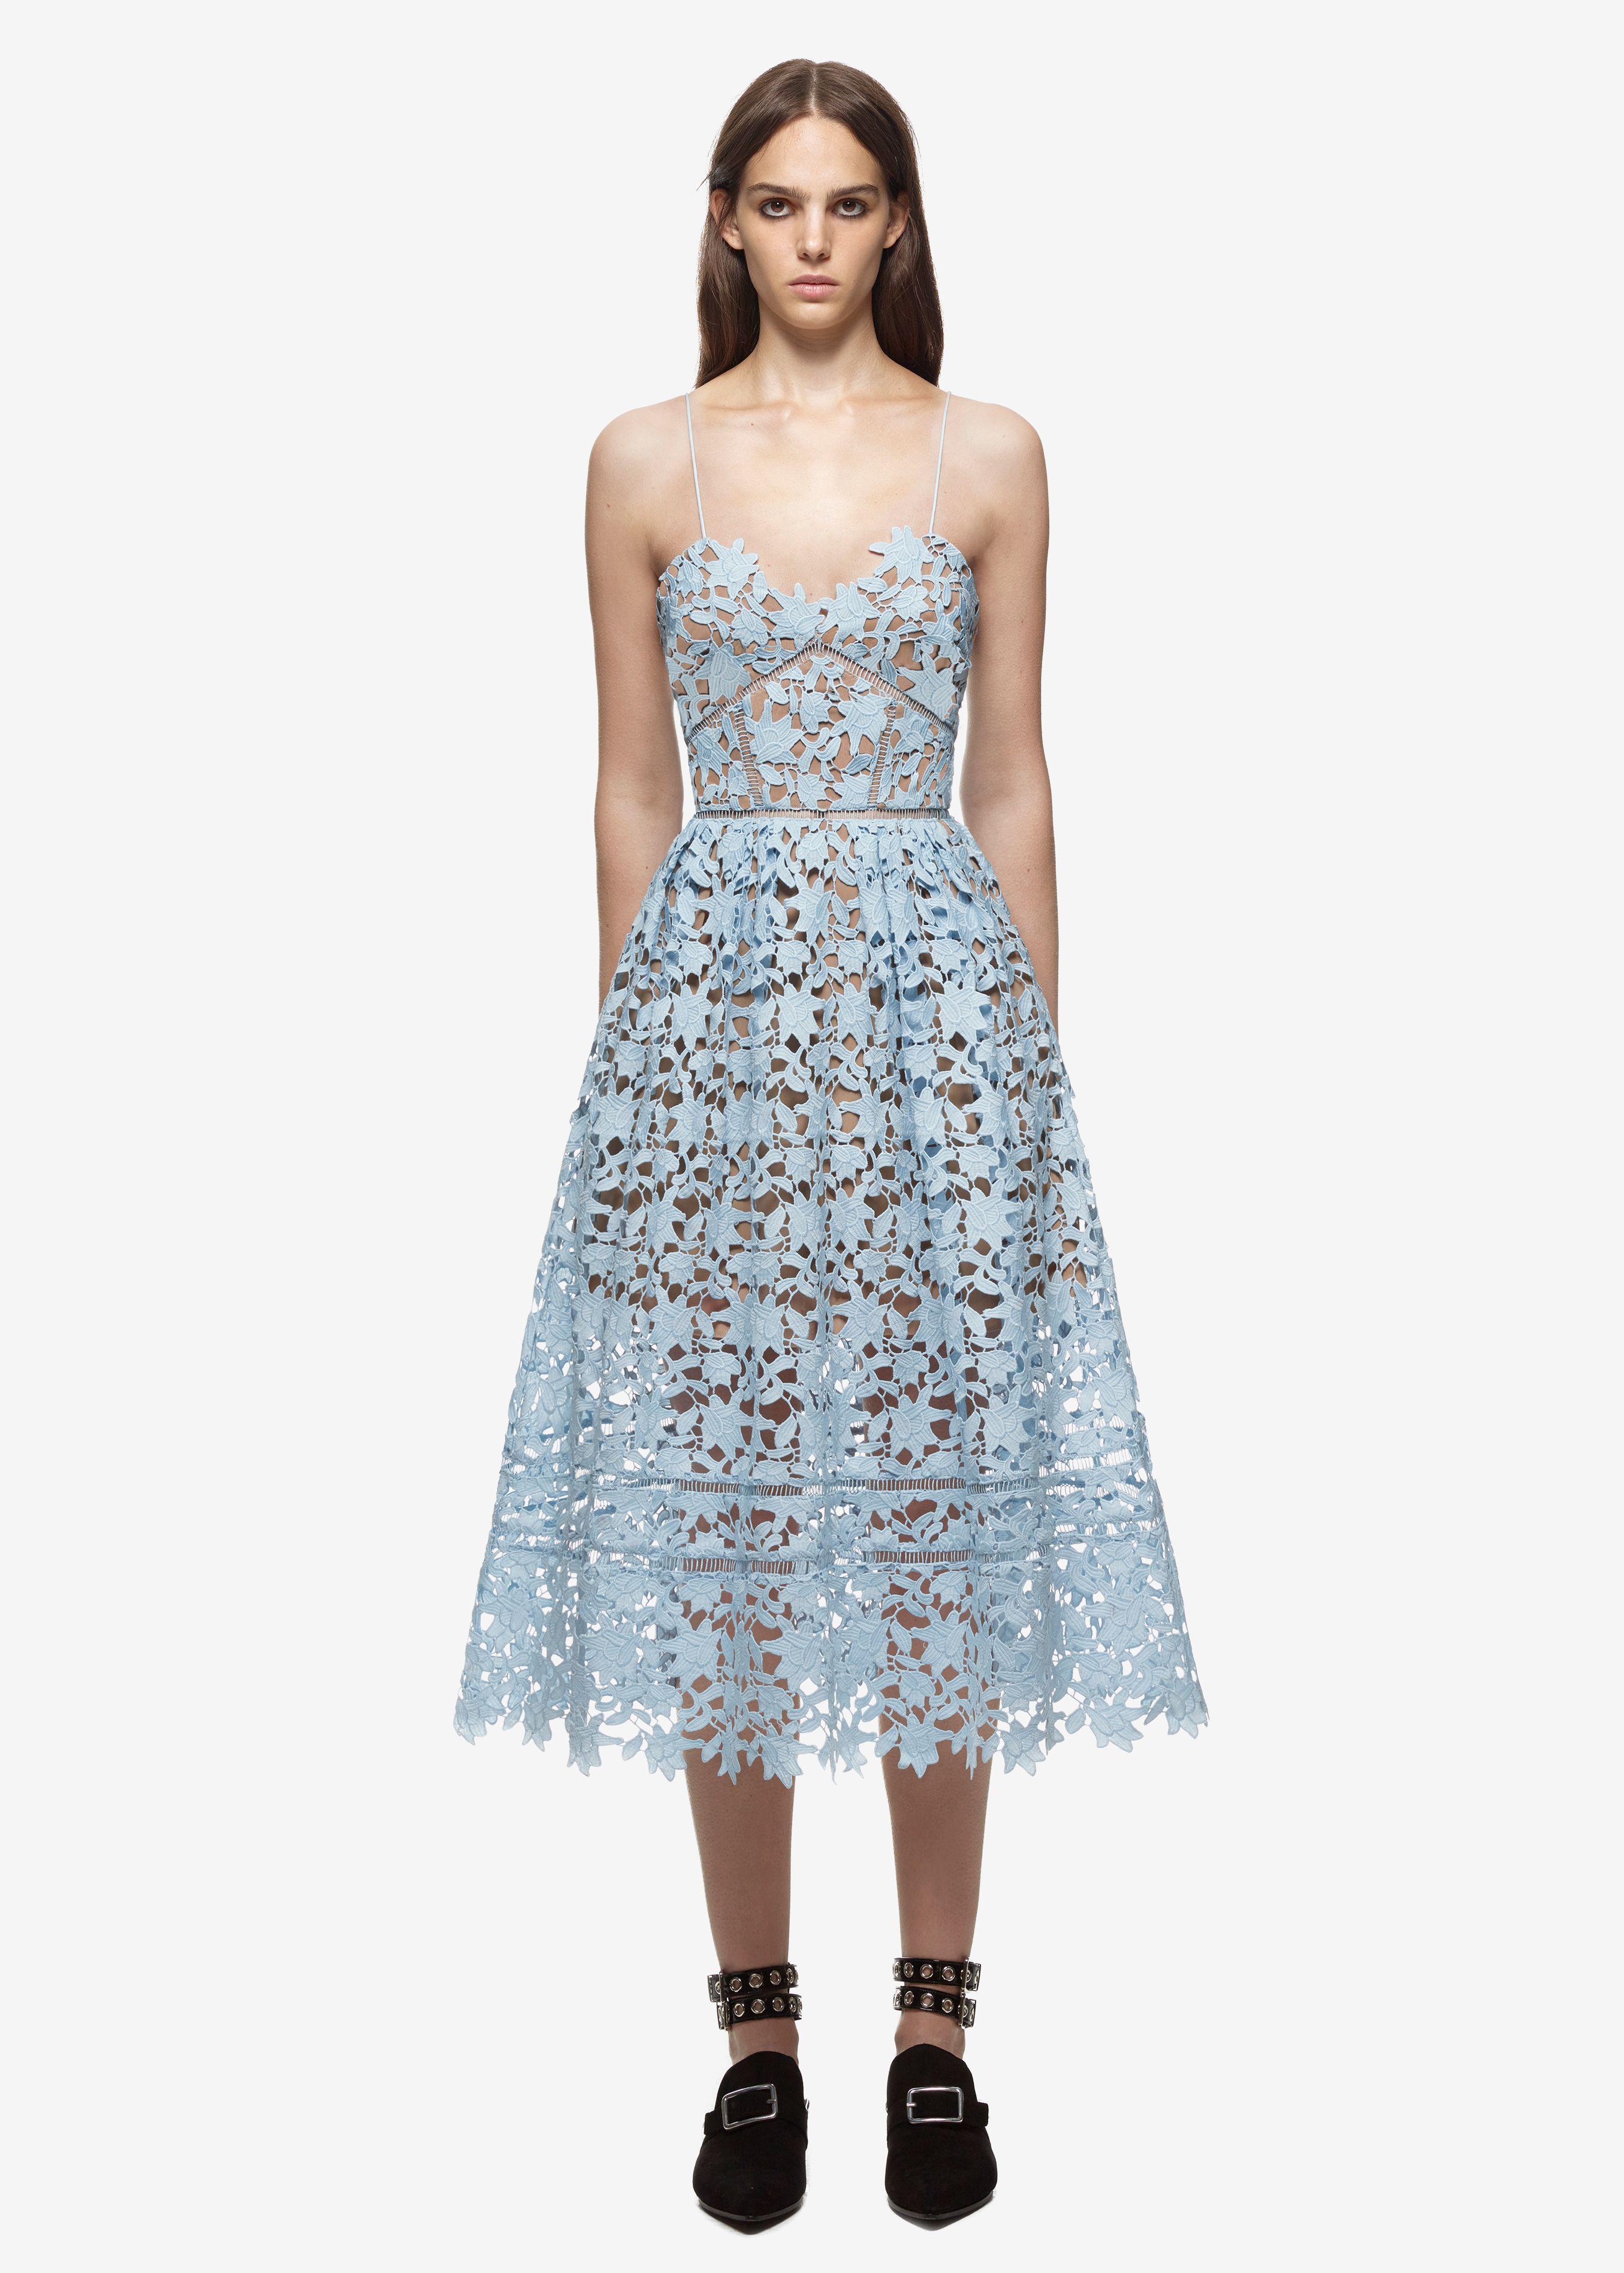 84a001b75616f Customer Login | Clothes | Dresses, Self portrait dress, Strapless ...